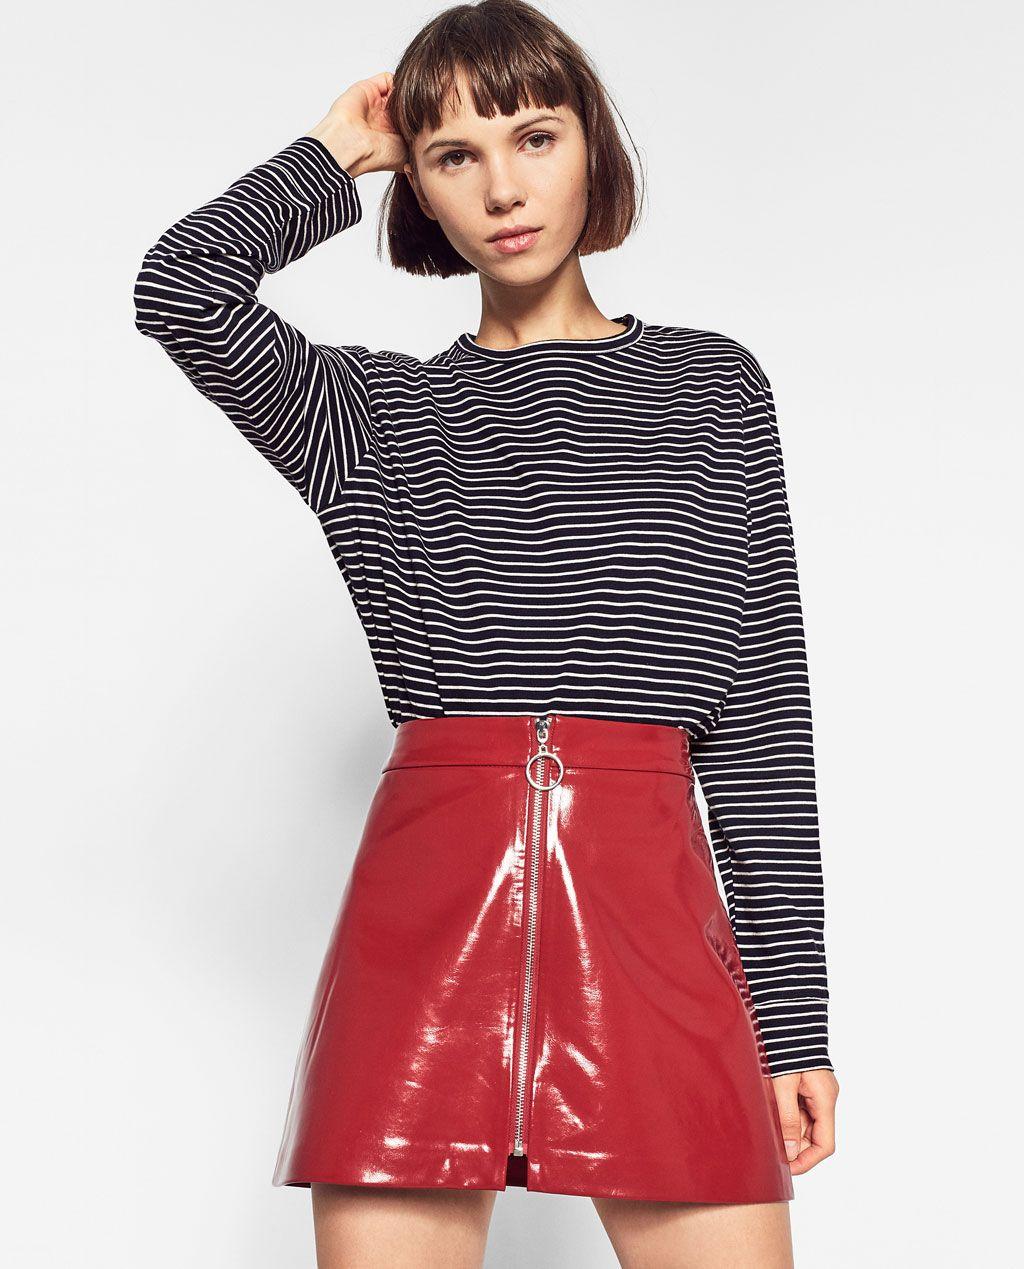 19d391a8f Image 2 of MINI PATENT FINISH SKIRT from Zara | Moda en 2019 | Ropa ...